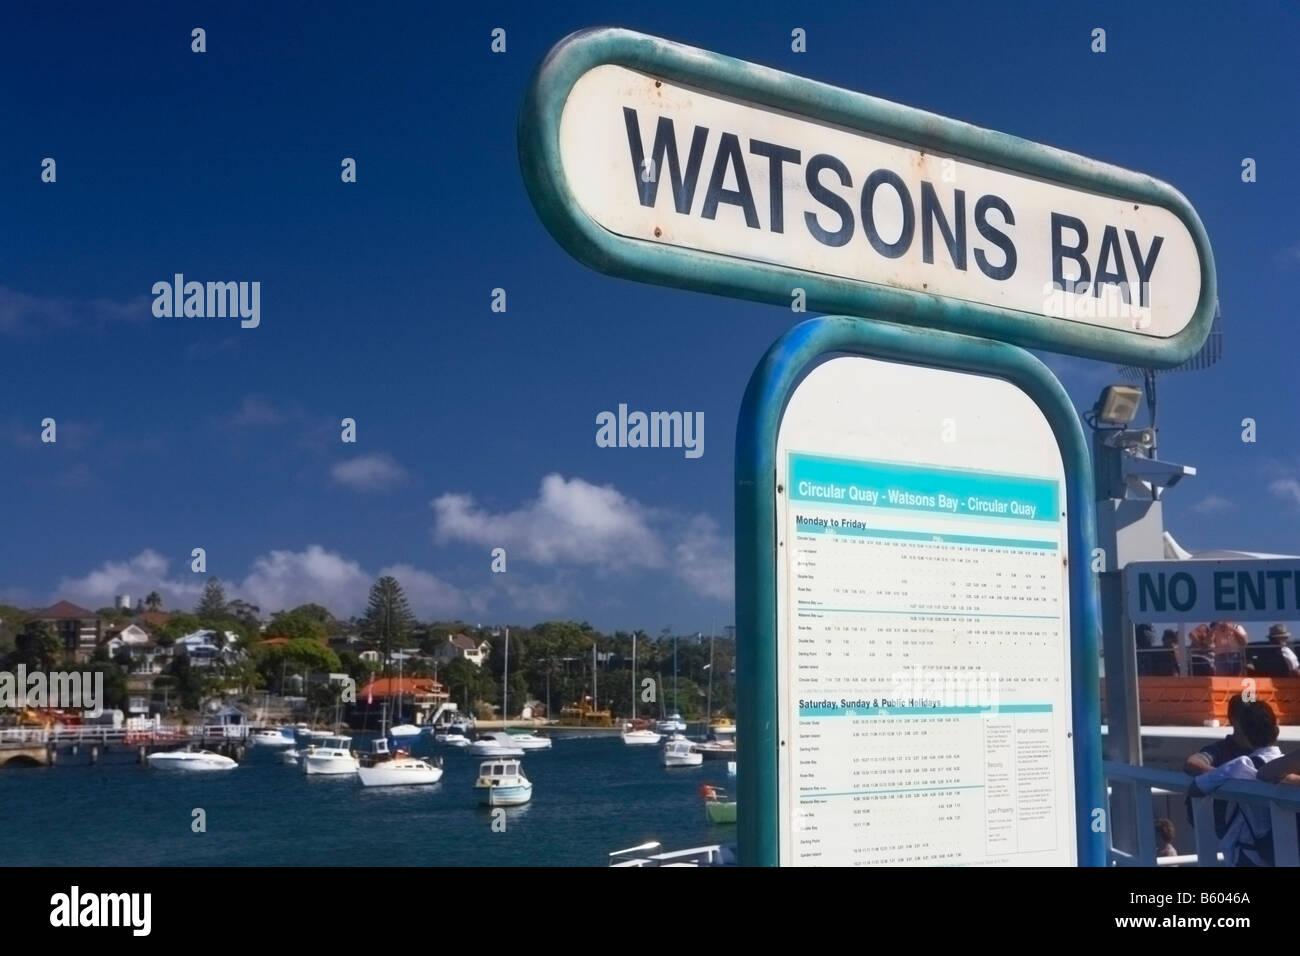 SYDNEY WATSONS BAY - Stock Image